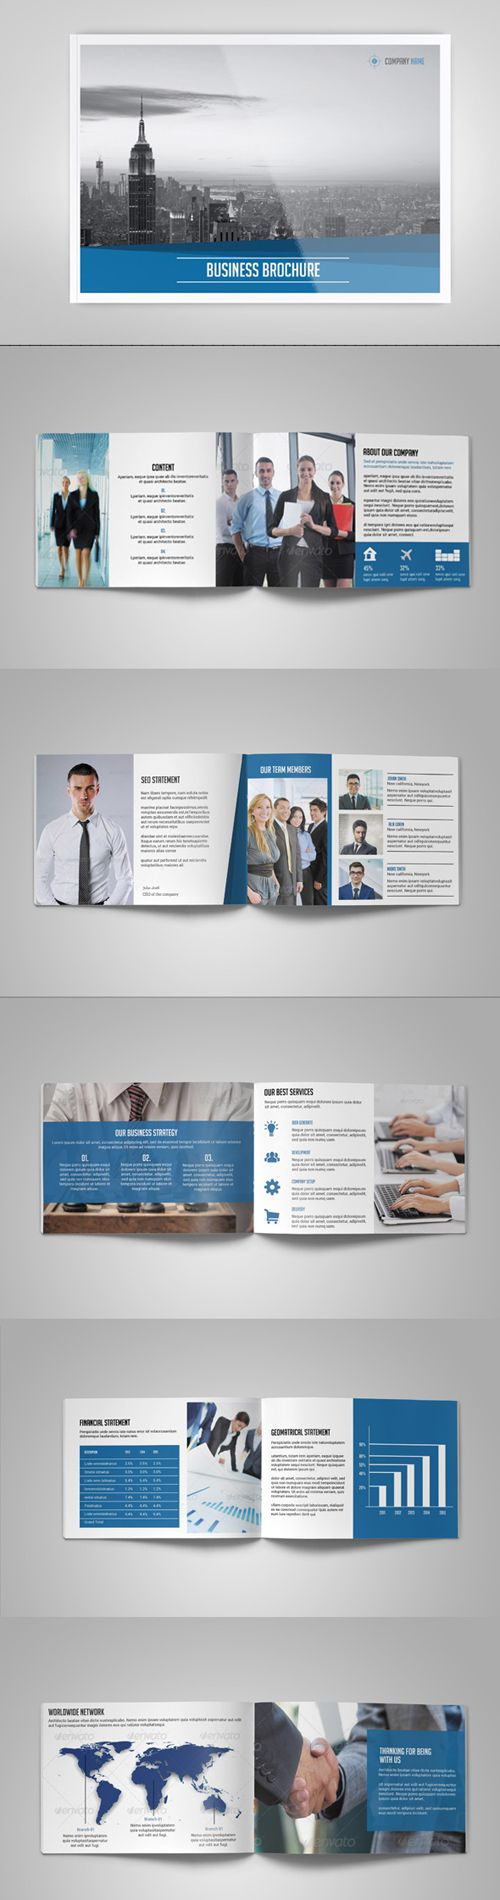 Business Brochure Catalog Template